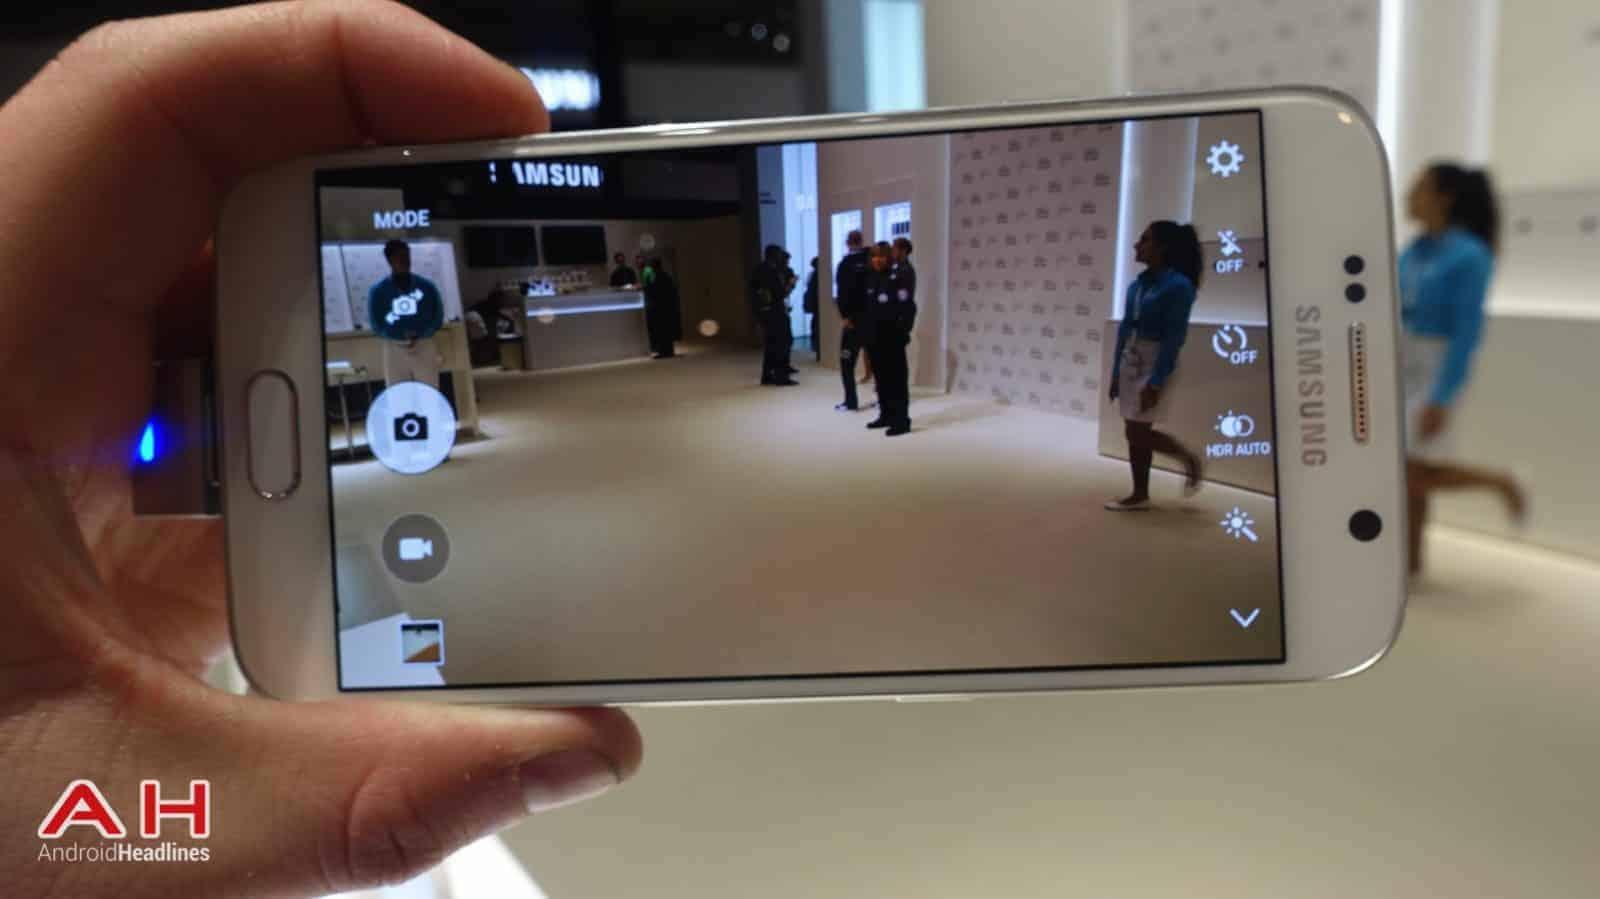 Galaxy S6 and Galaxy S6 Edge MWC AH 08